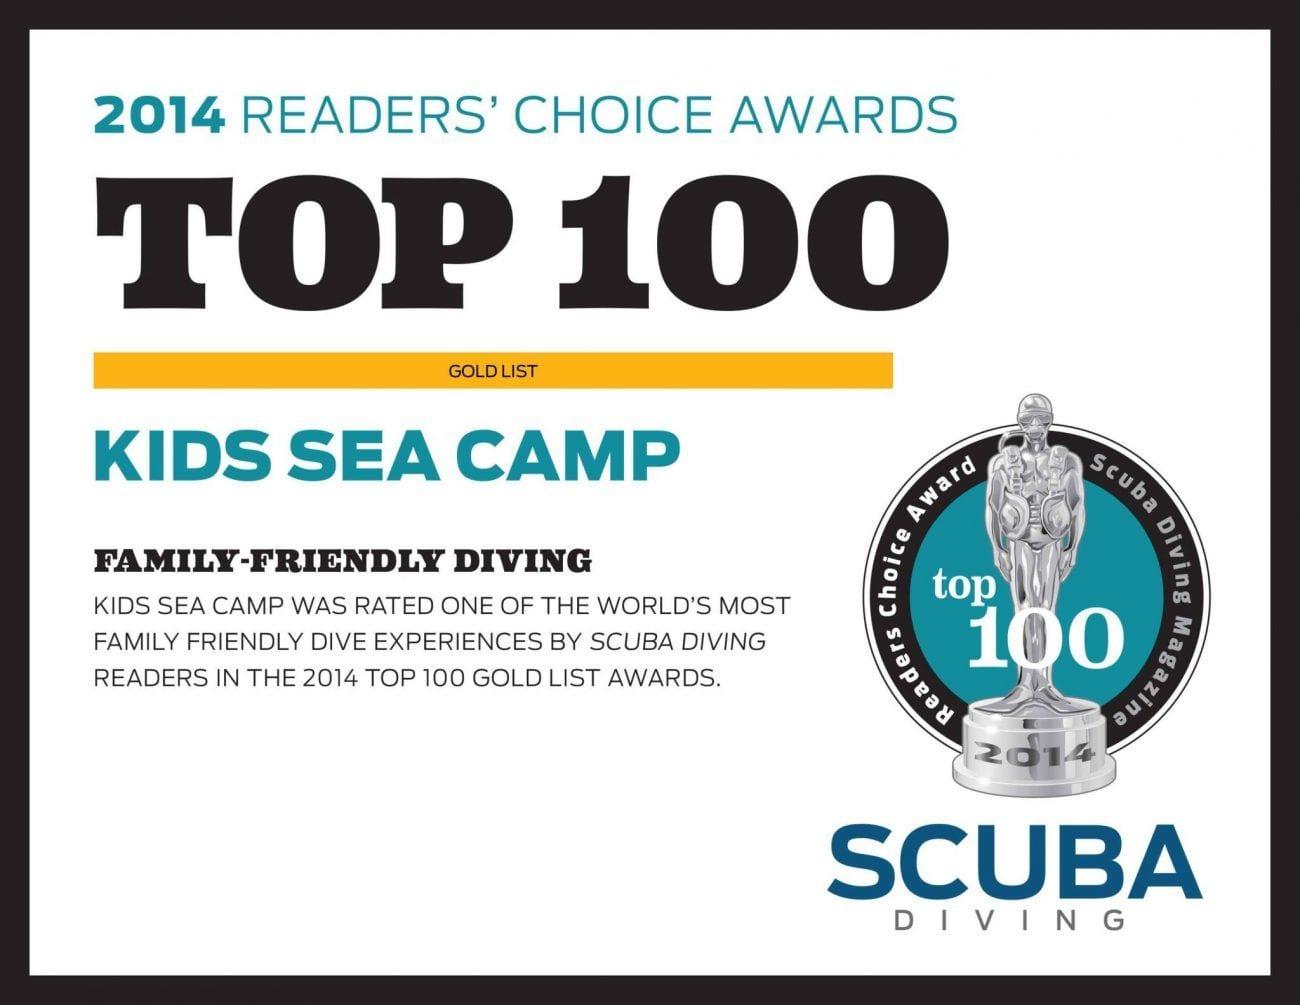 family-friendly dive vacation, reader's choice award, kids sea camp